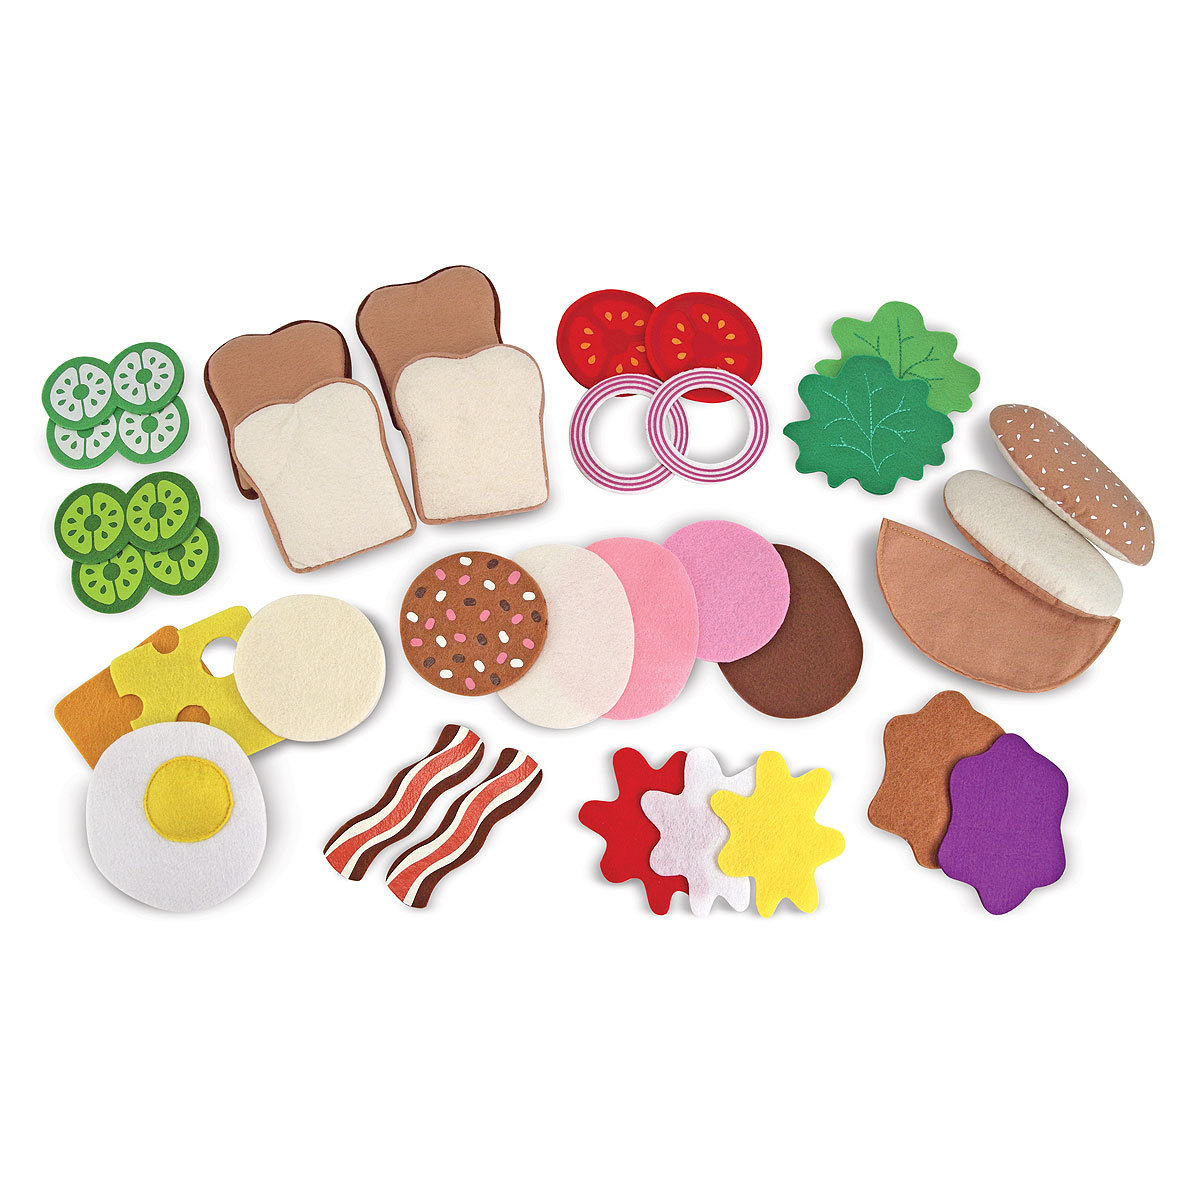 Mes premiers jouets Sandwichs en feutre Sandwichs en feutre